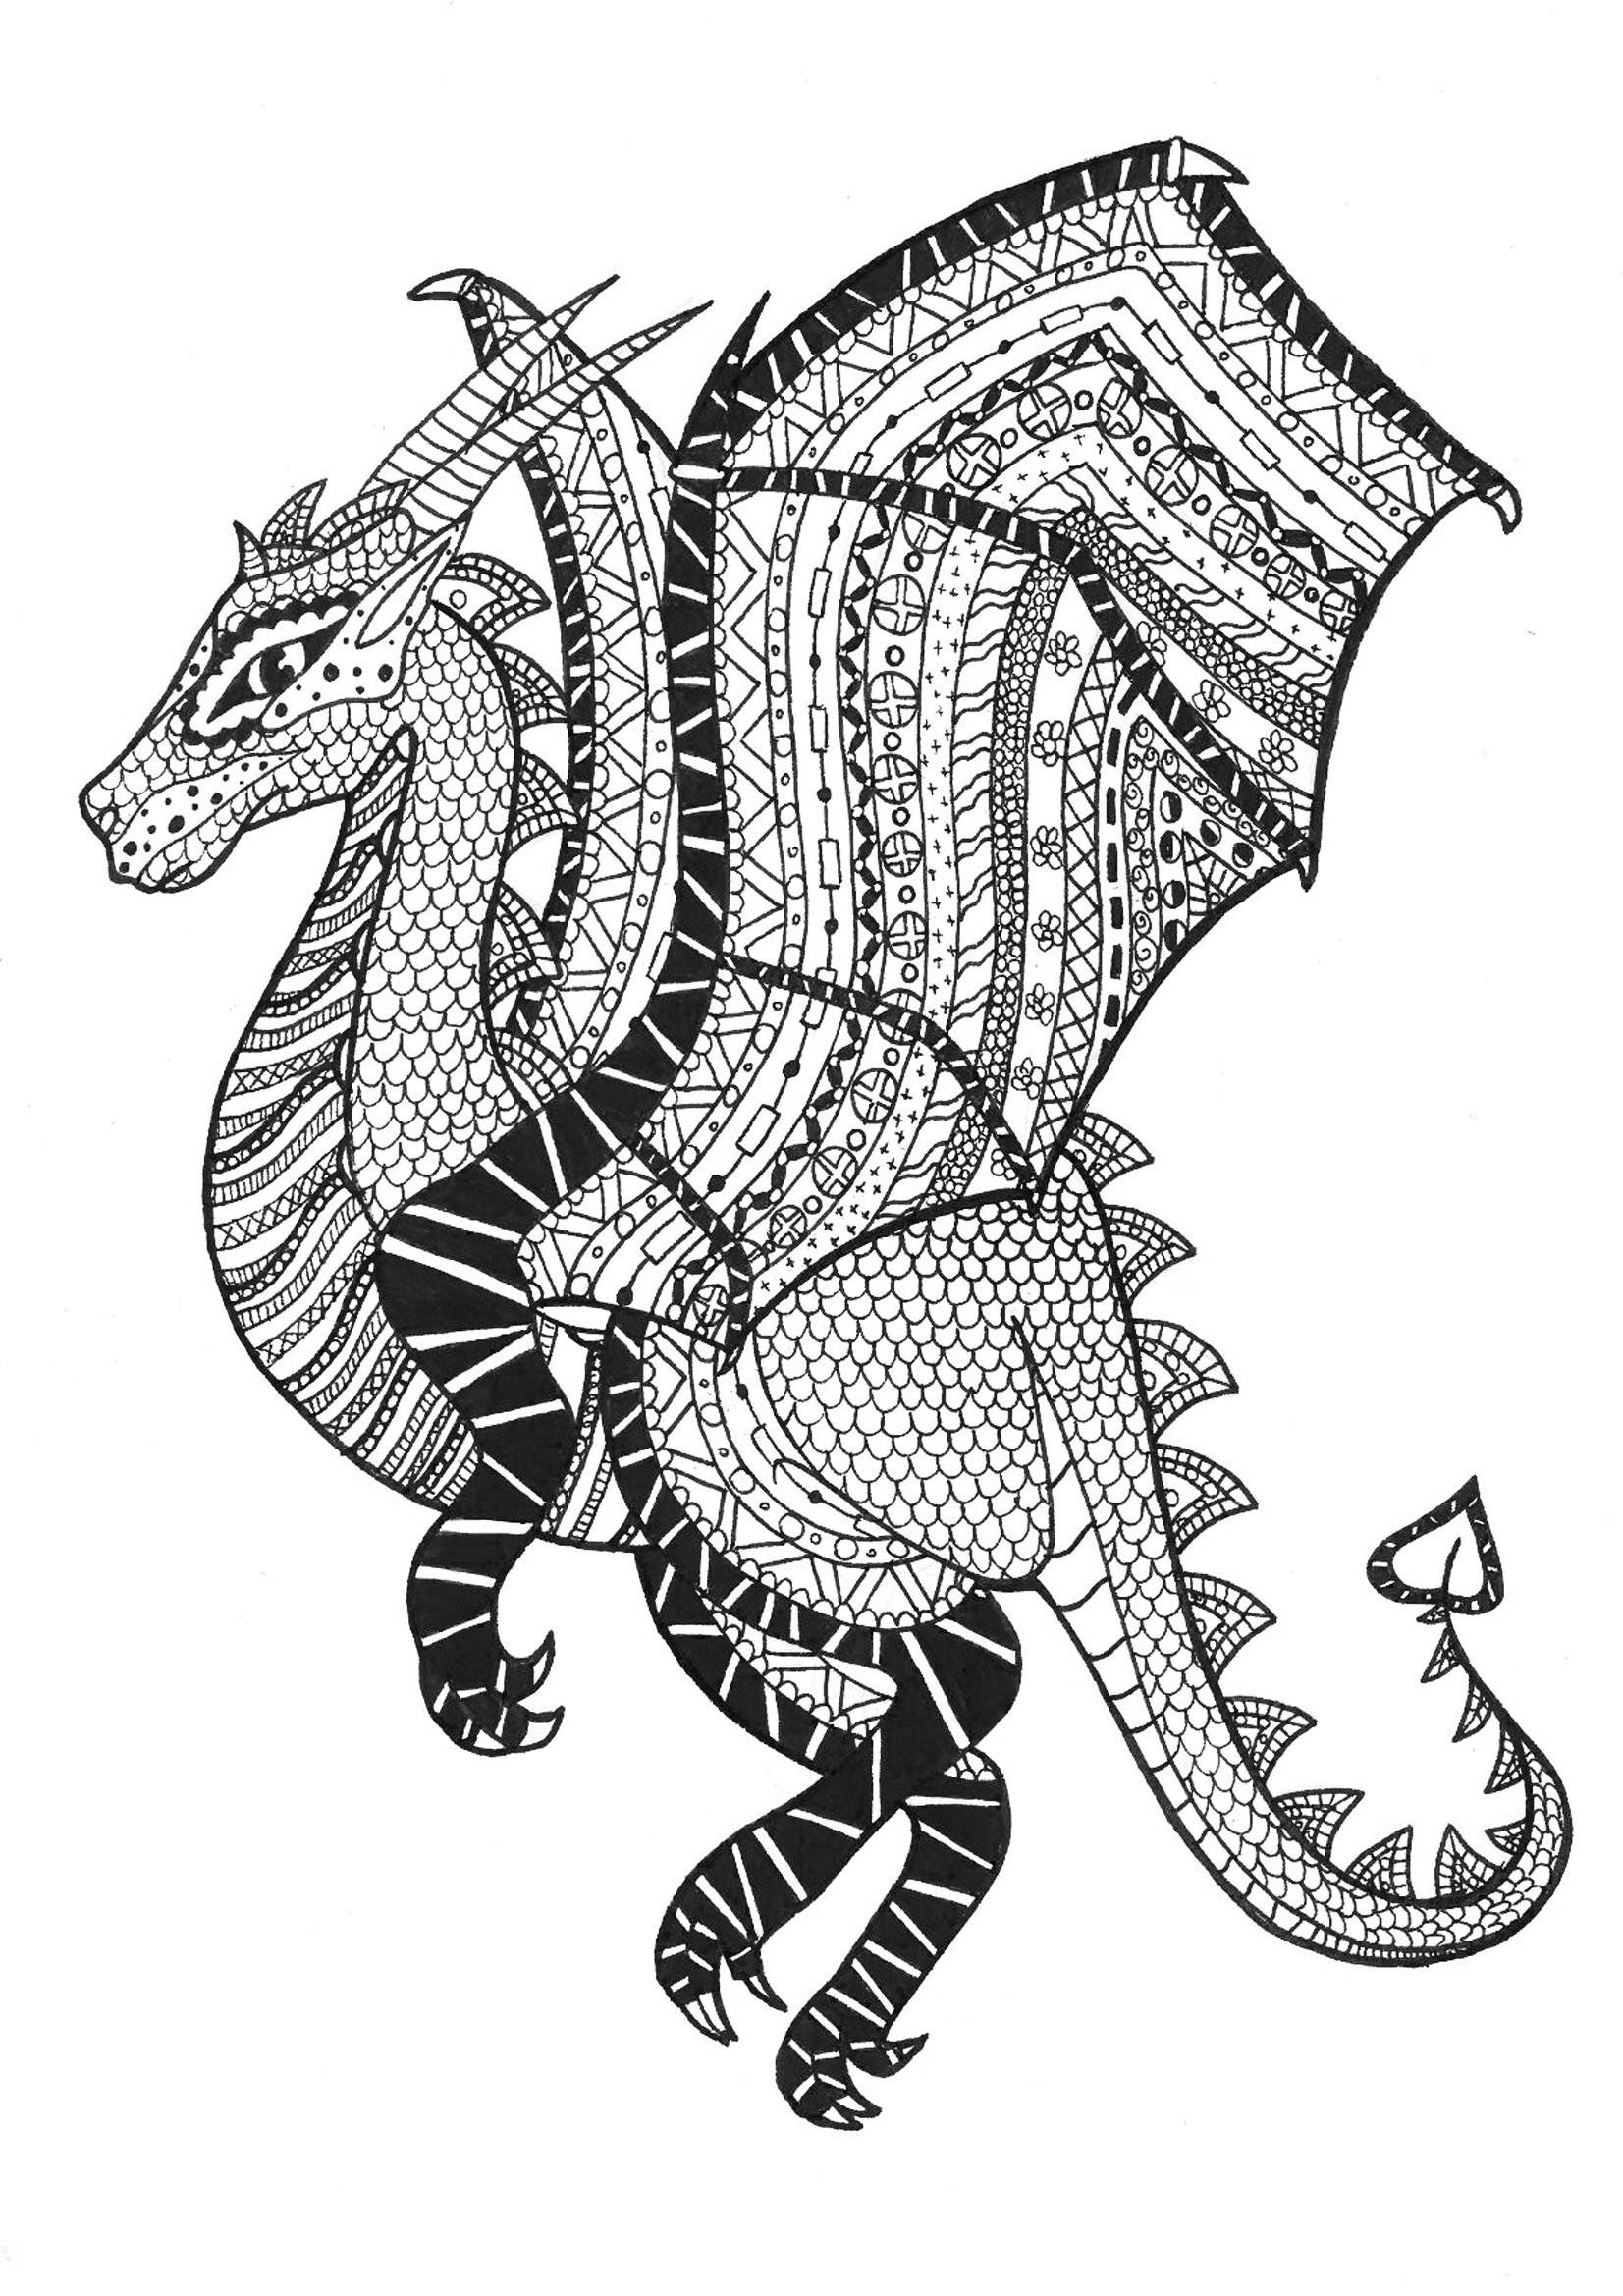 free zentangle coloring pages angelfish zentangle coloring page free printable pages coloring free zentangle